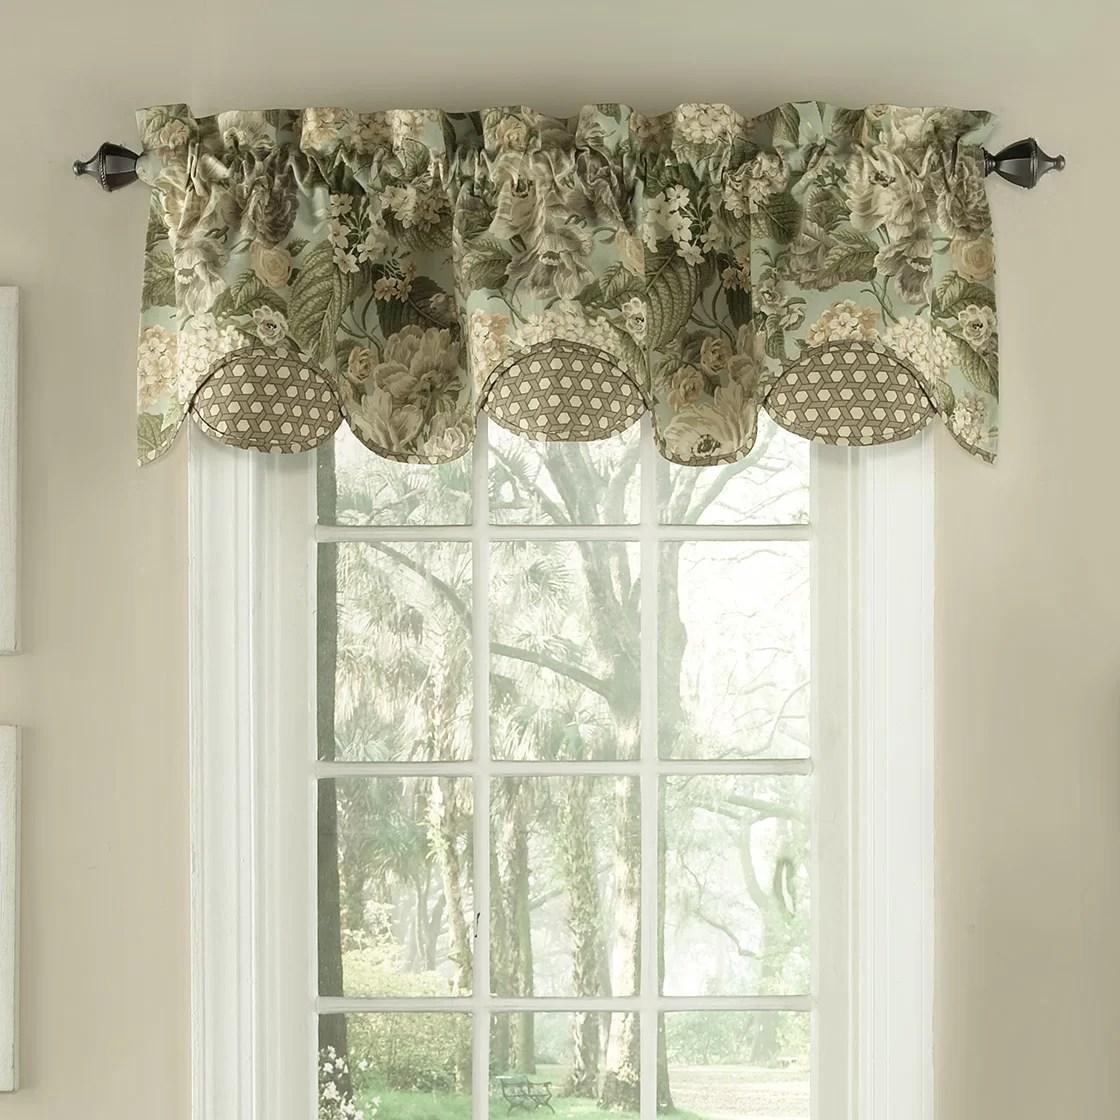 Waverly Garden Glory Scalloped Floral Curtain Valance  Reviews  Wayfair